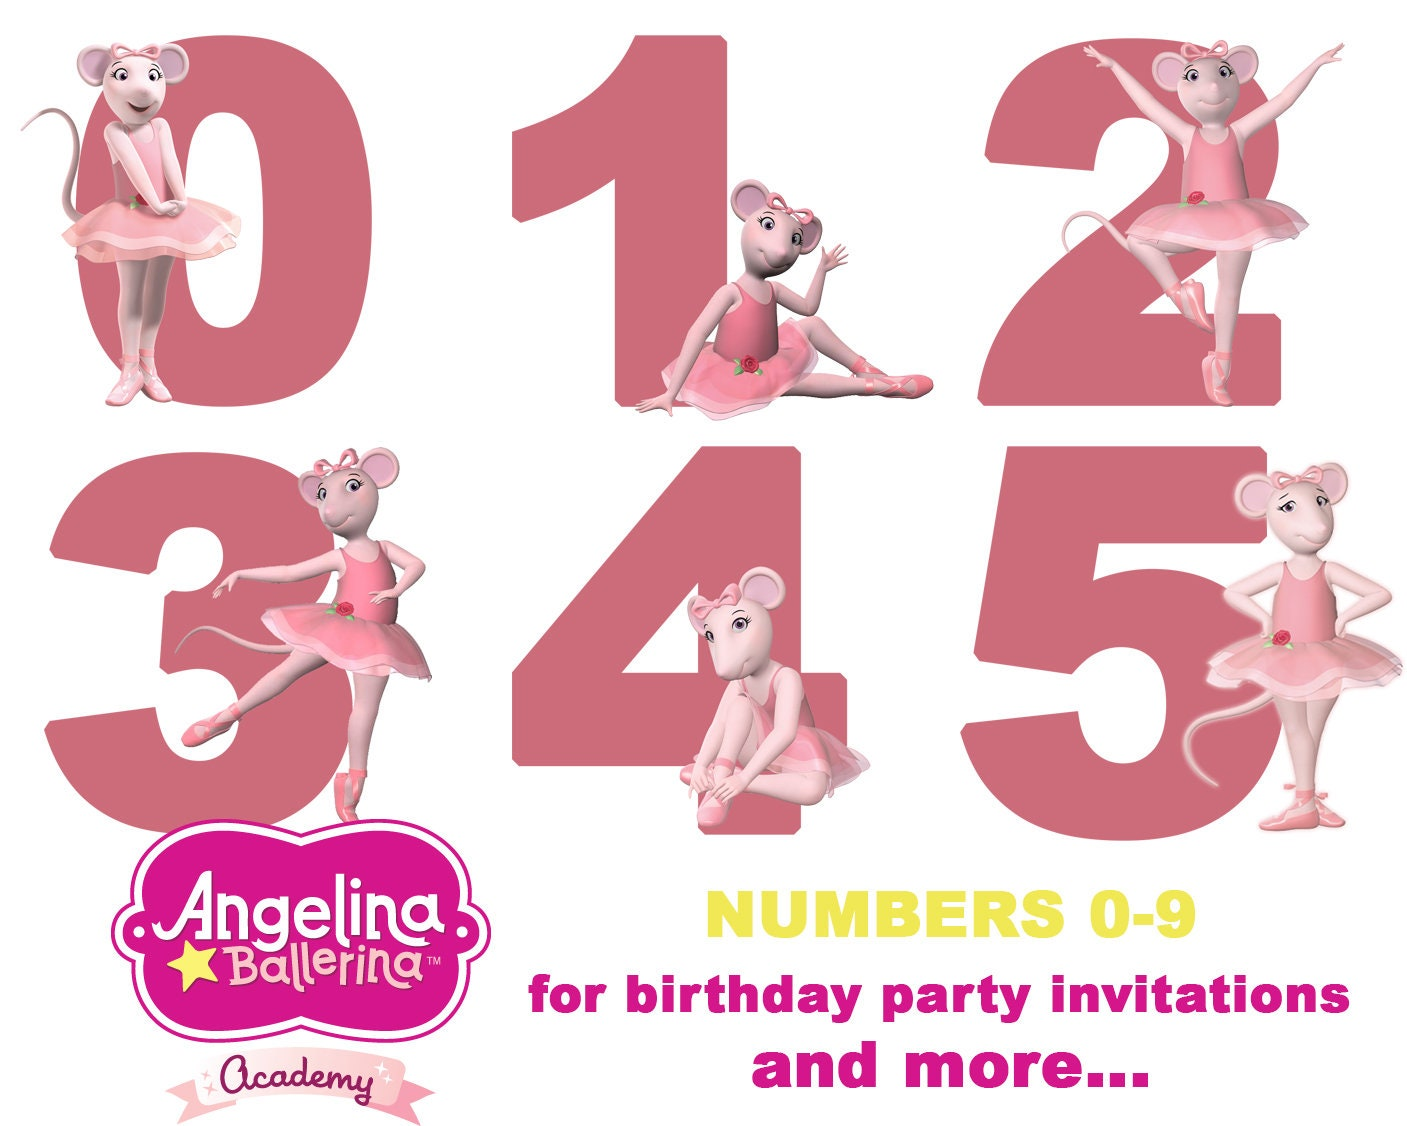 Best collection of 50 ANGELINA BALLERINA Clipart 50 High Quality – Angelina Ballerina Birthday Invitations